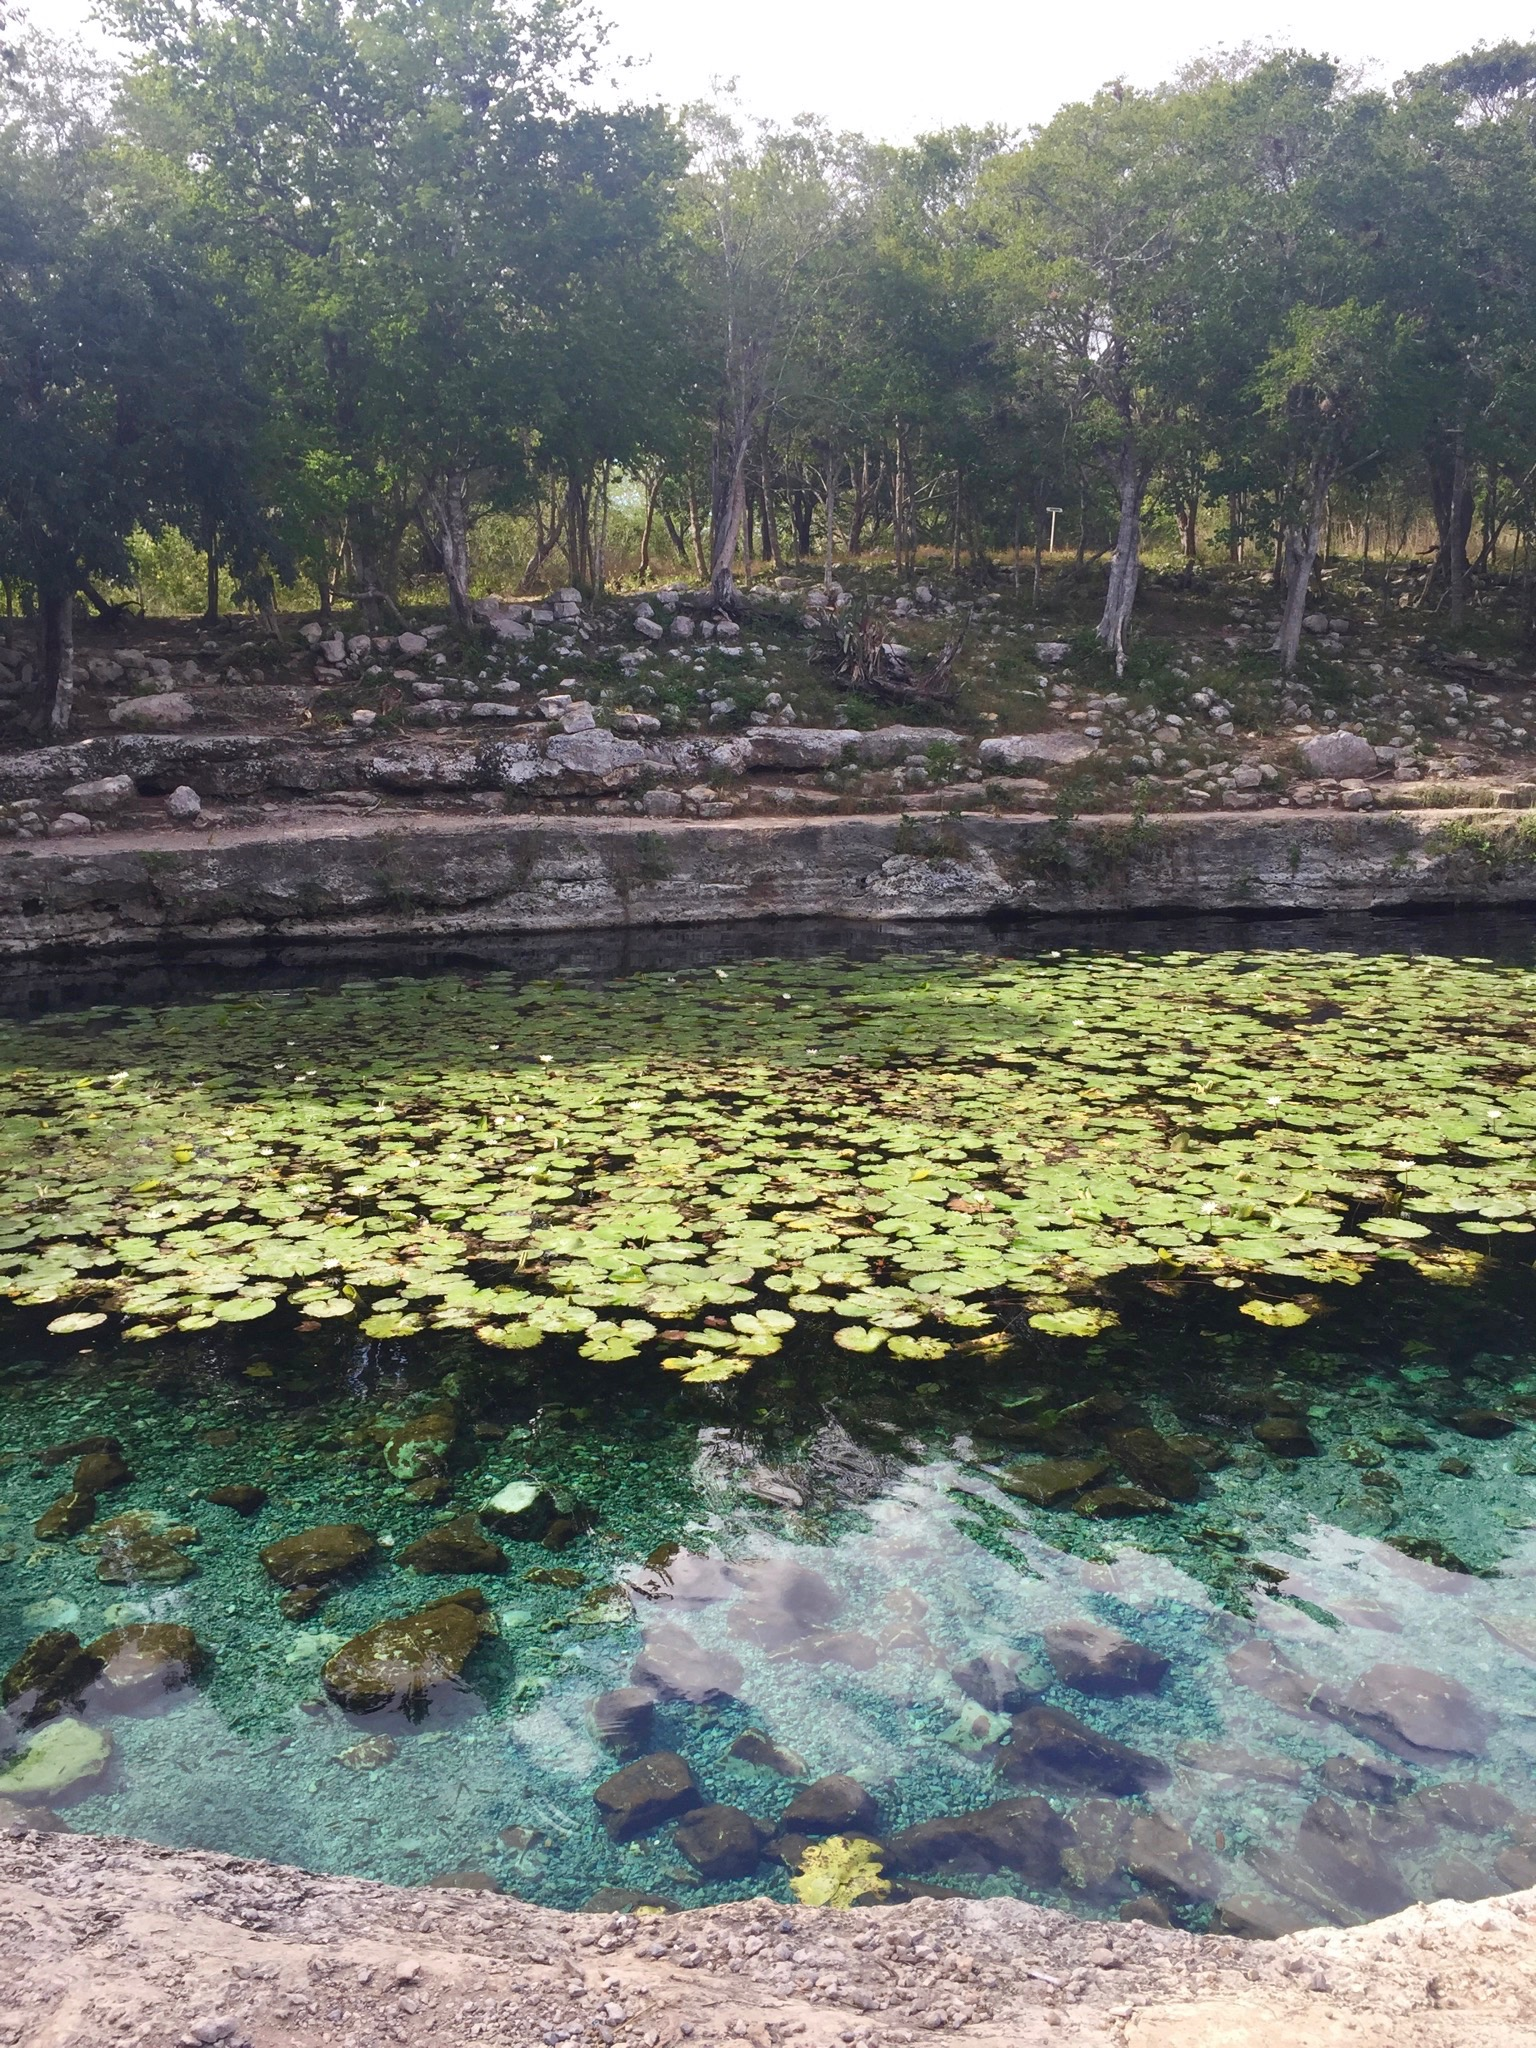 mayan-ruins-cenote-Xlakah-Dzibilchaltun-mexico